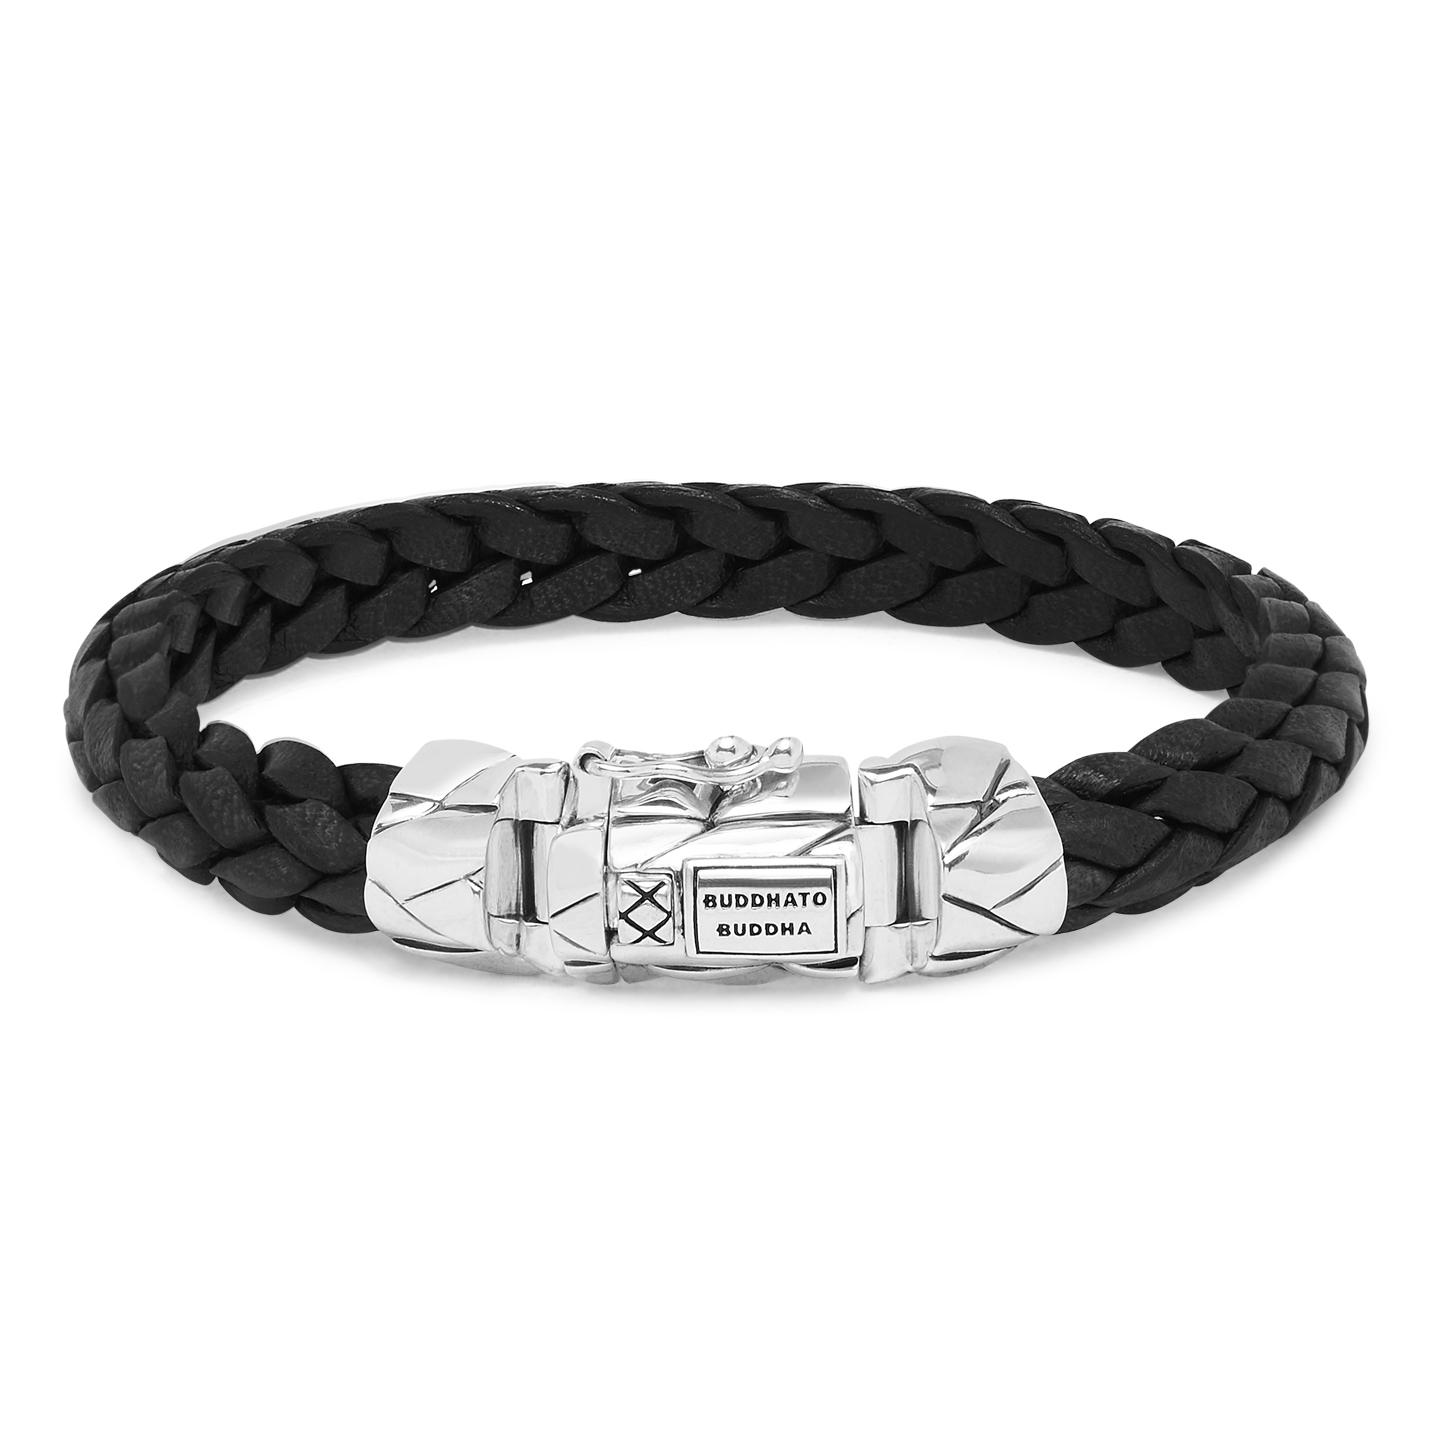 Buddha to Buddha 126BL Armband Mangky Small leder zwart (E) 19 cm